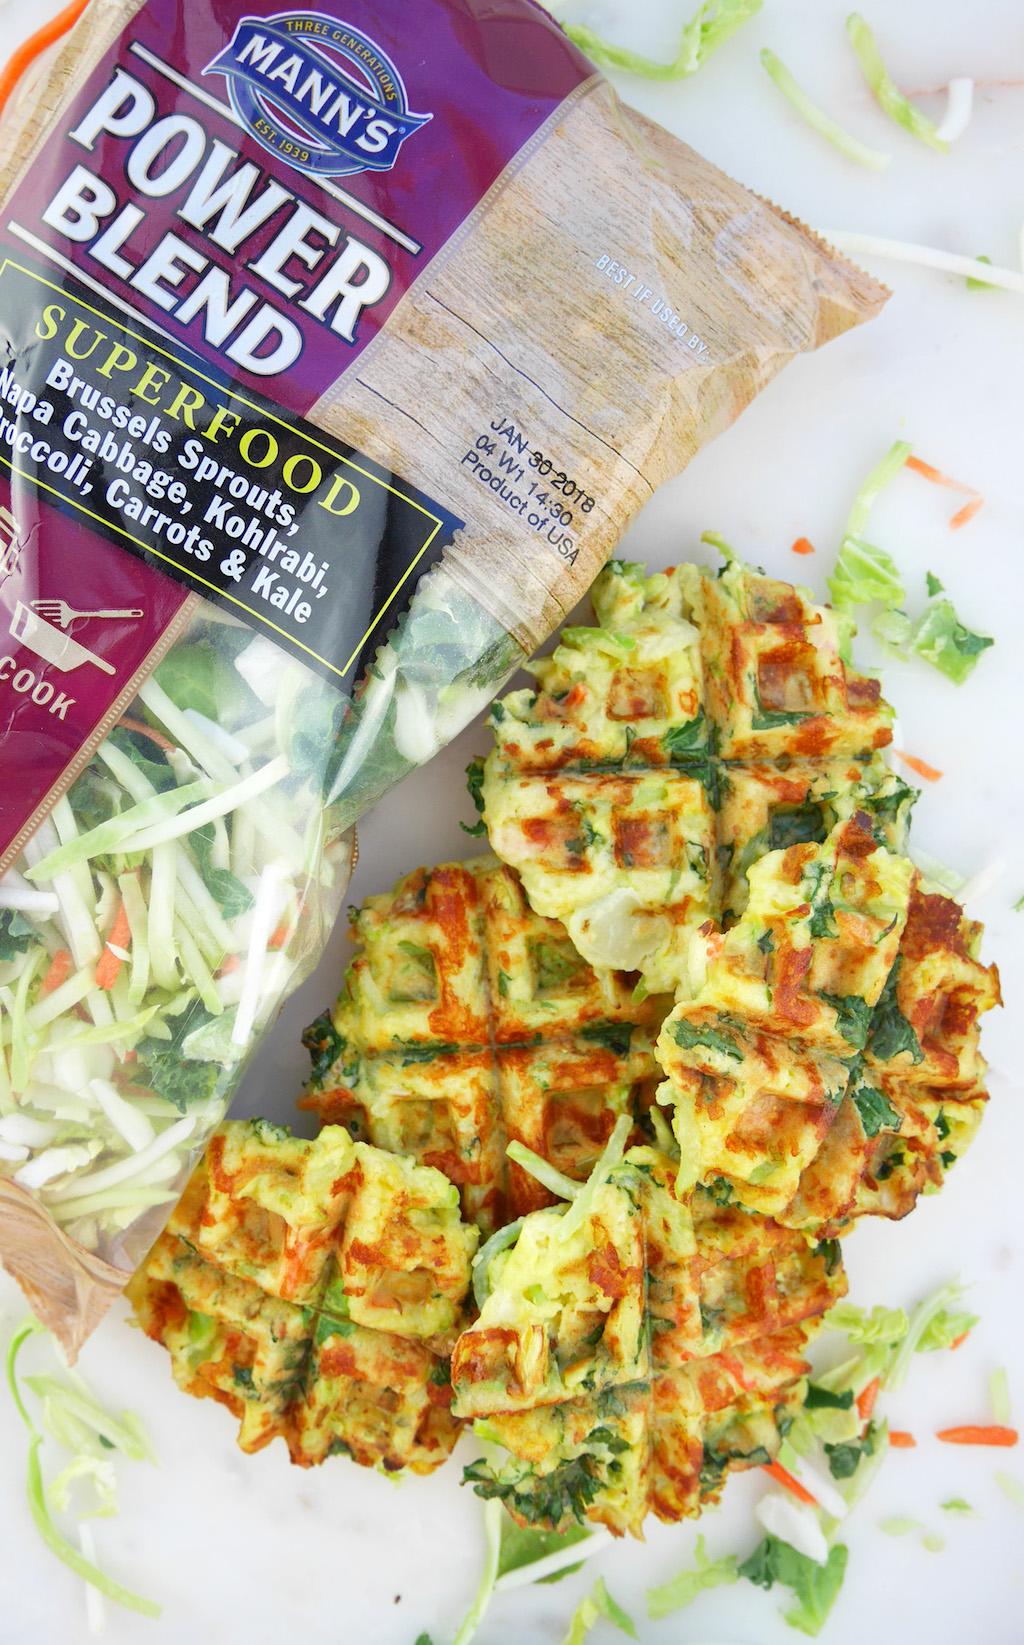 Veggie Blend Breakfast Waffles Mann's Power Blend